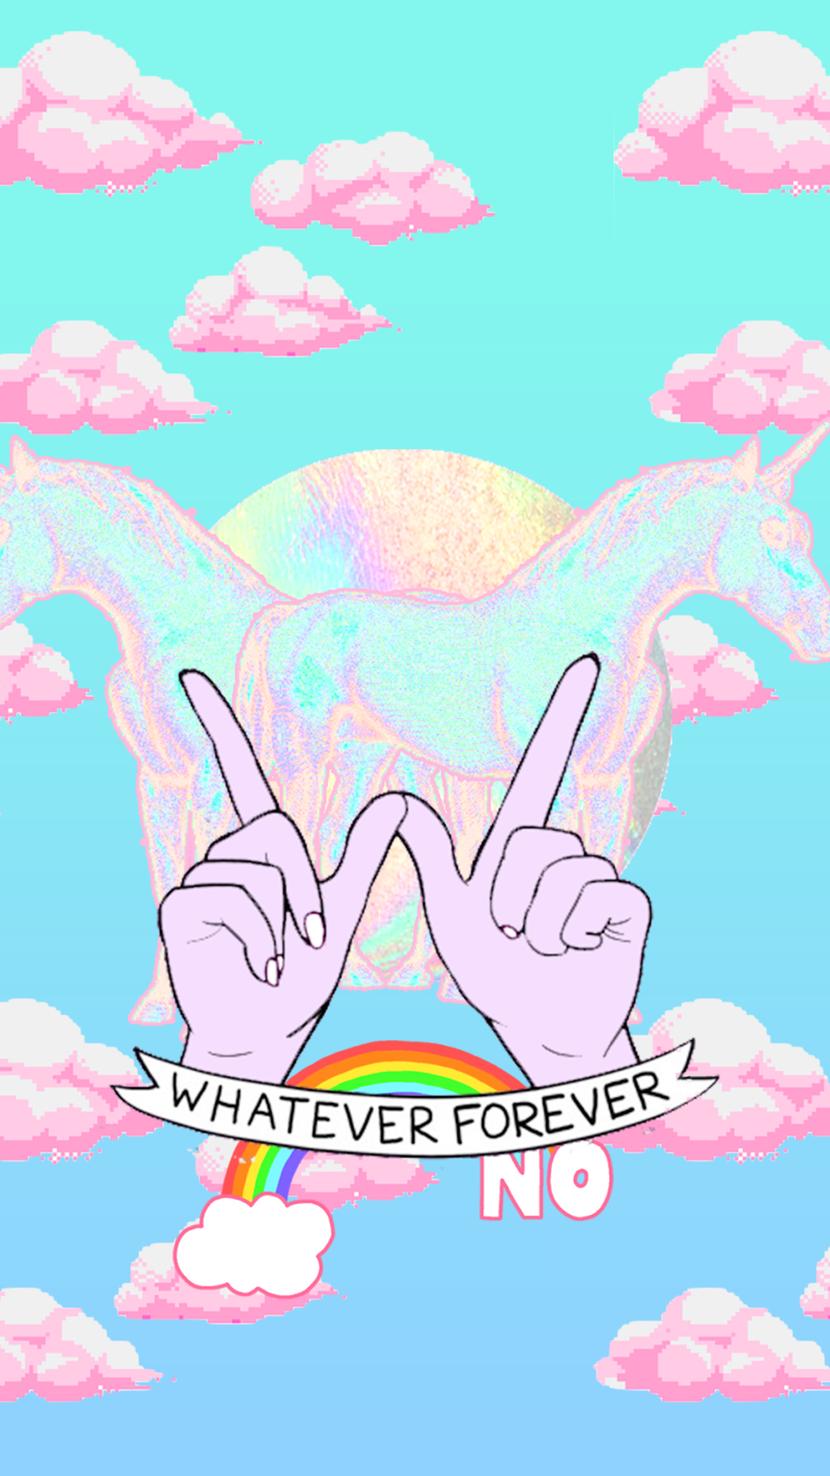 Wallpaper iphone tumblr unicorn - Whatever Forever Background Wallpaper Lock Screen